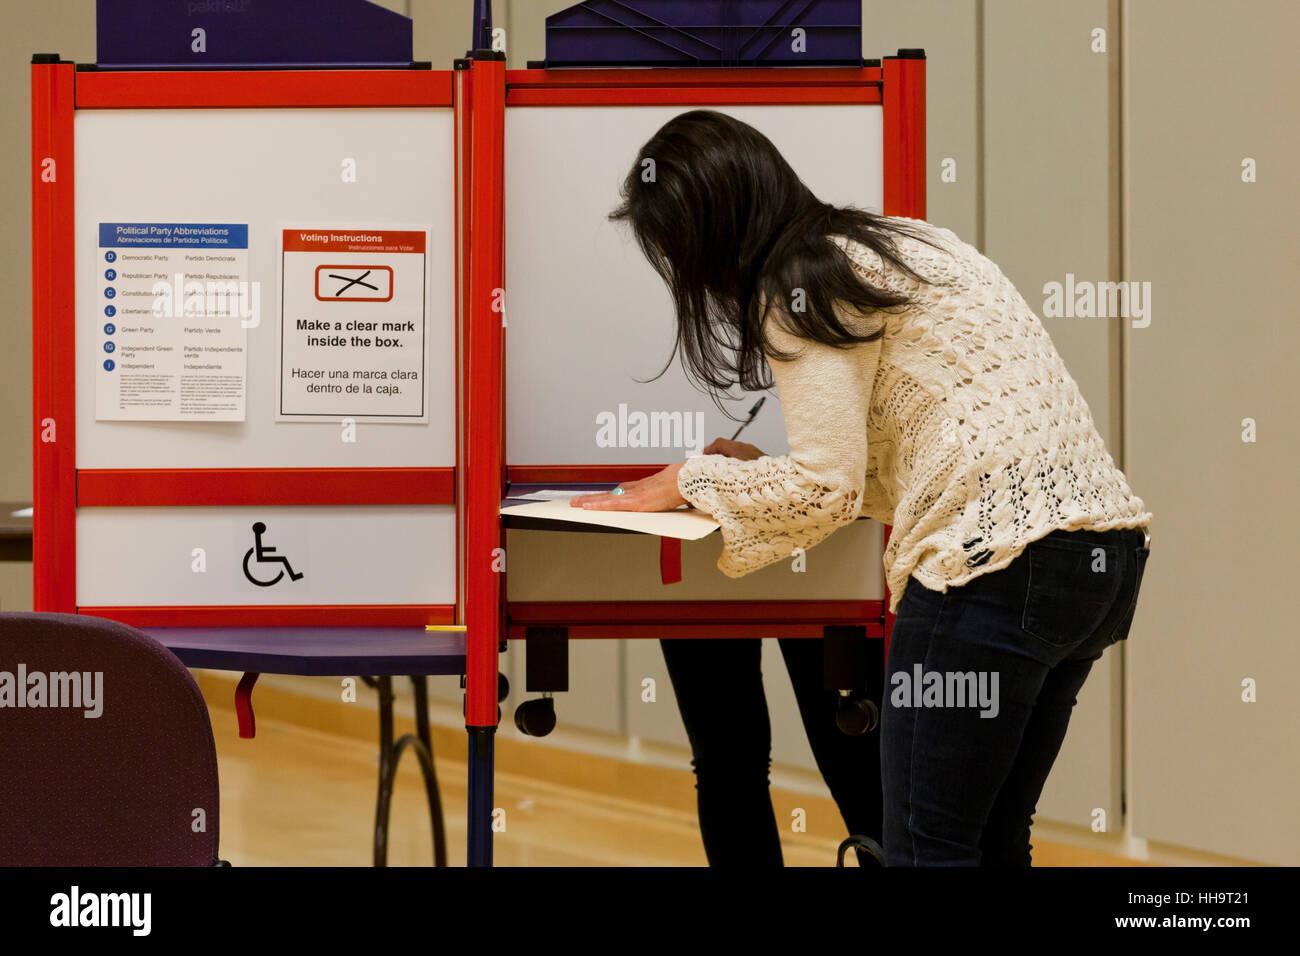 Female voter at ballot box during 2016 general elections - Arlington, Virginia USA - Stock Image